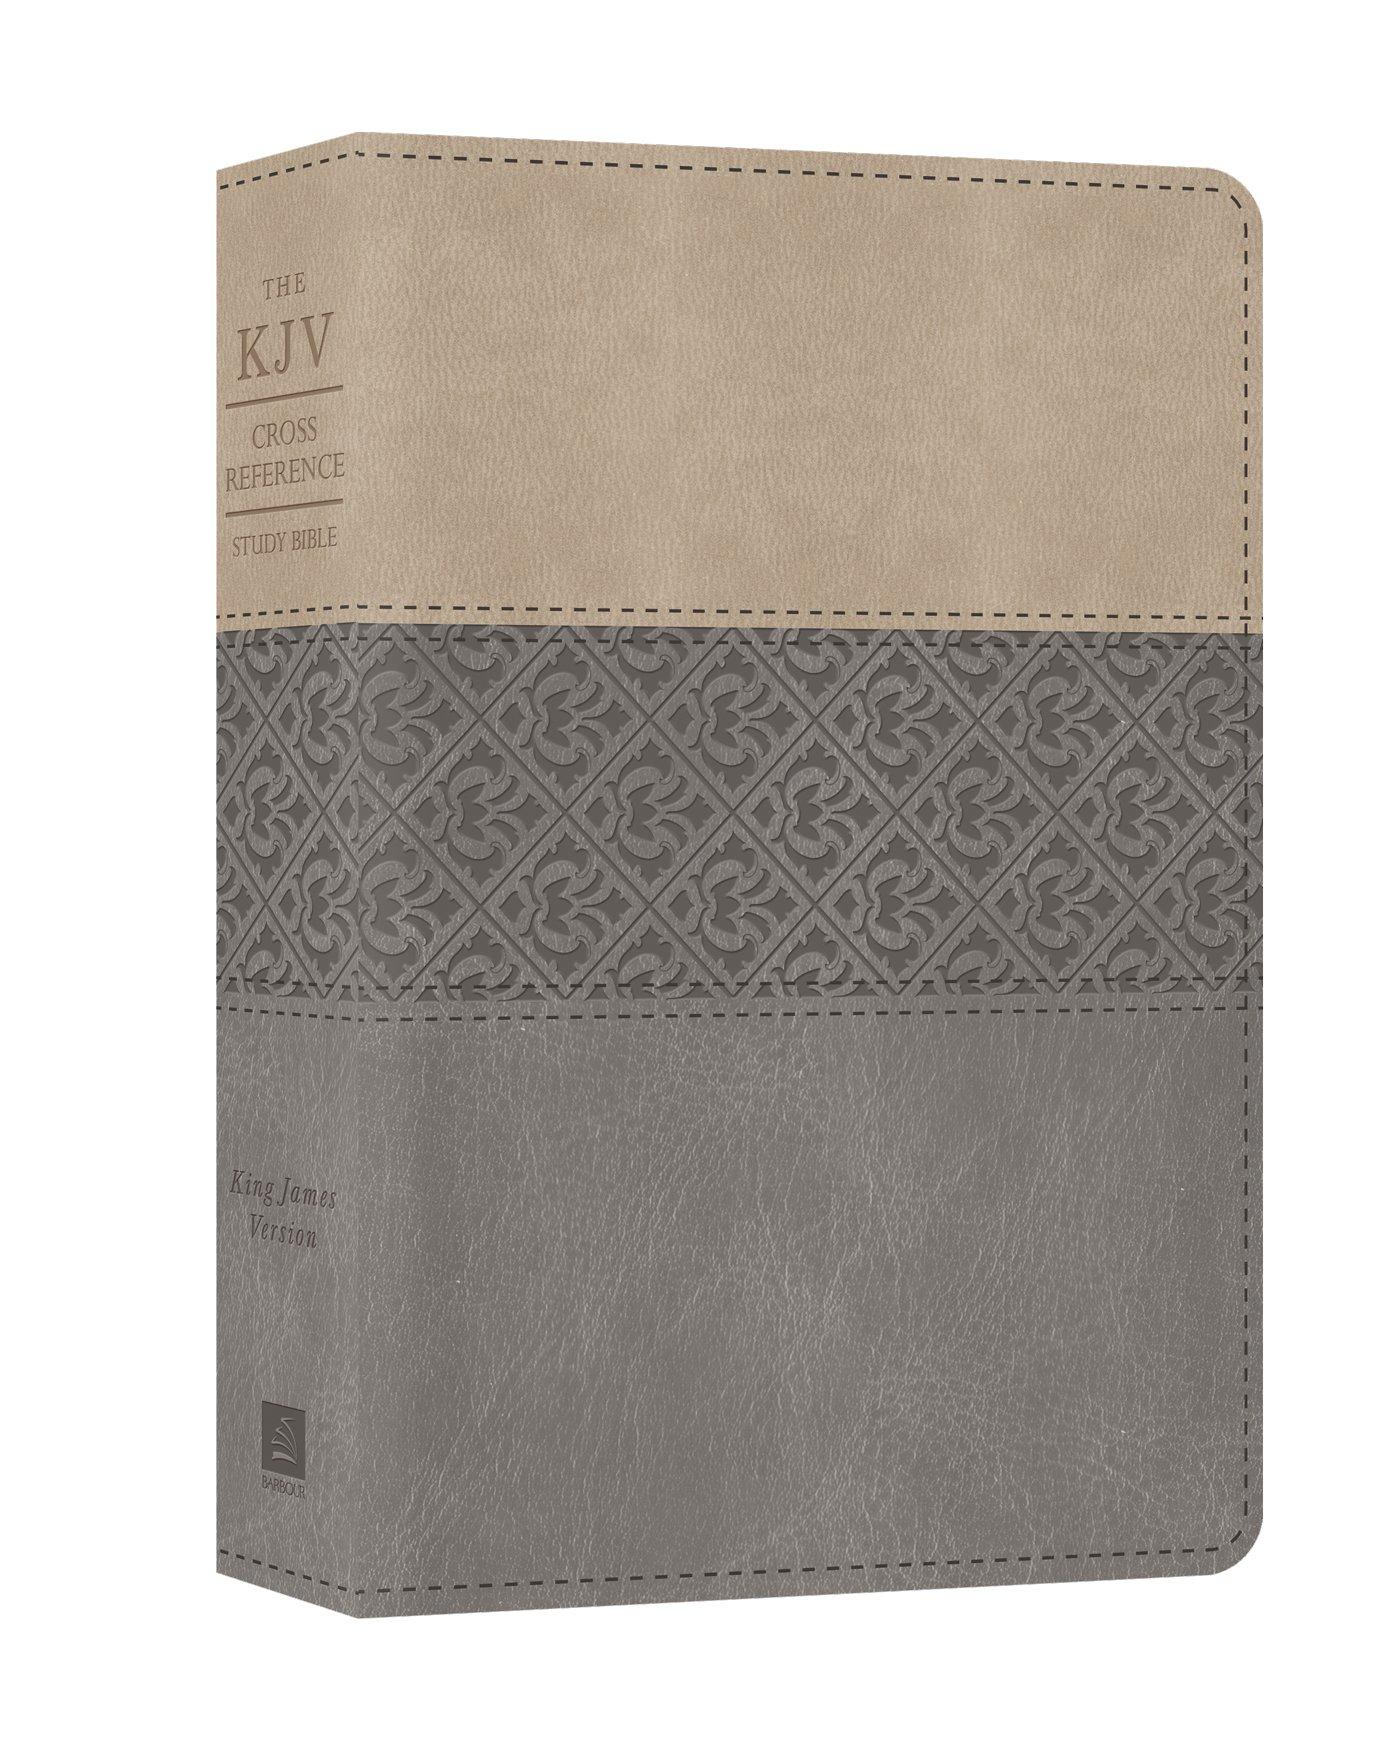 KJV Cross Reference Study Bible product image